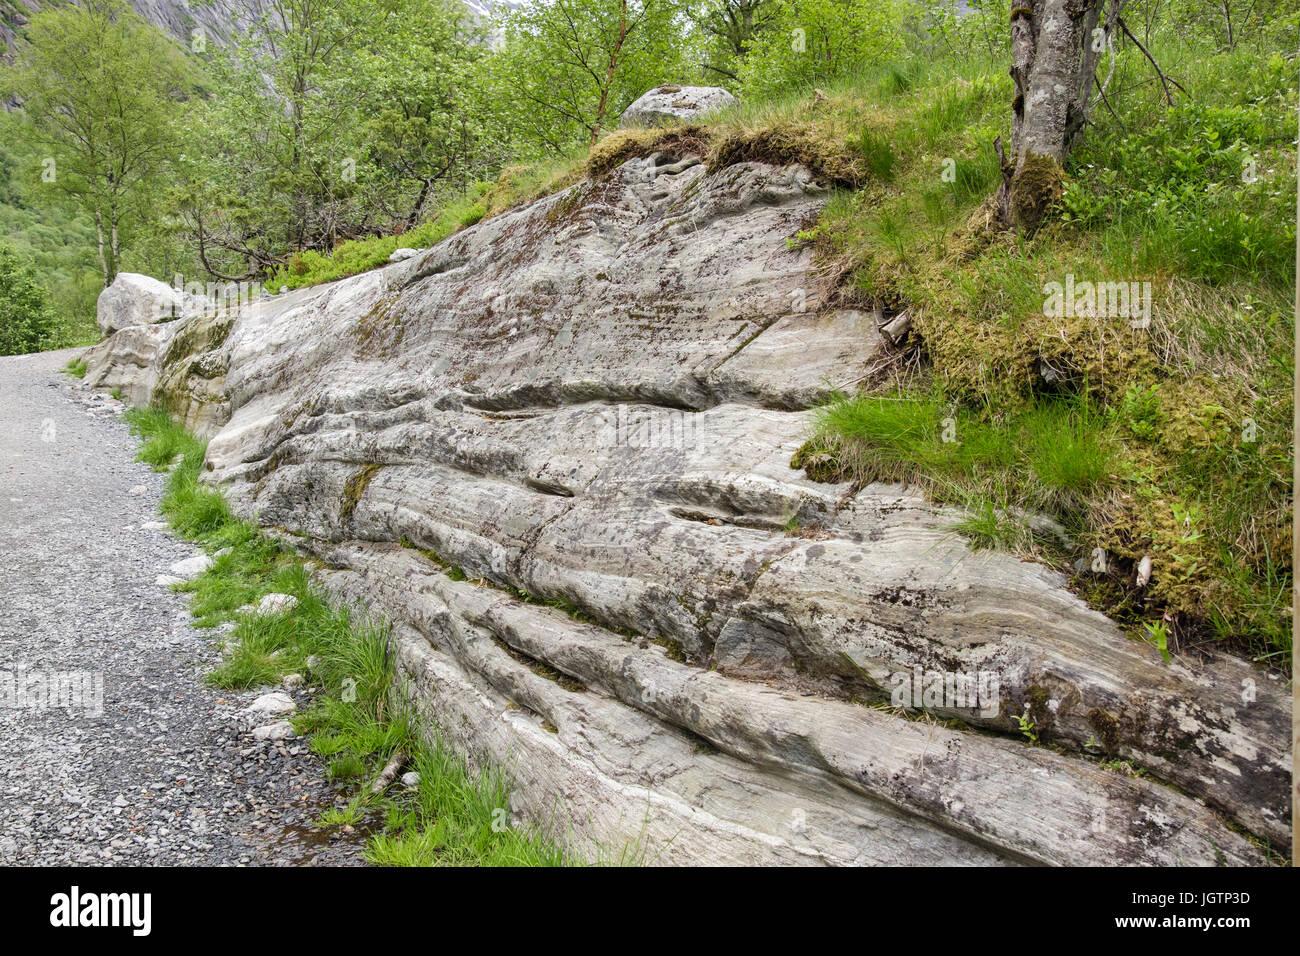 Horizontal scratch lines or striations gauged in rock by receding Briksdal glacier in Briksdalen or Briks valley. - Stock Image